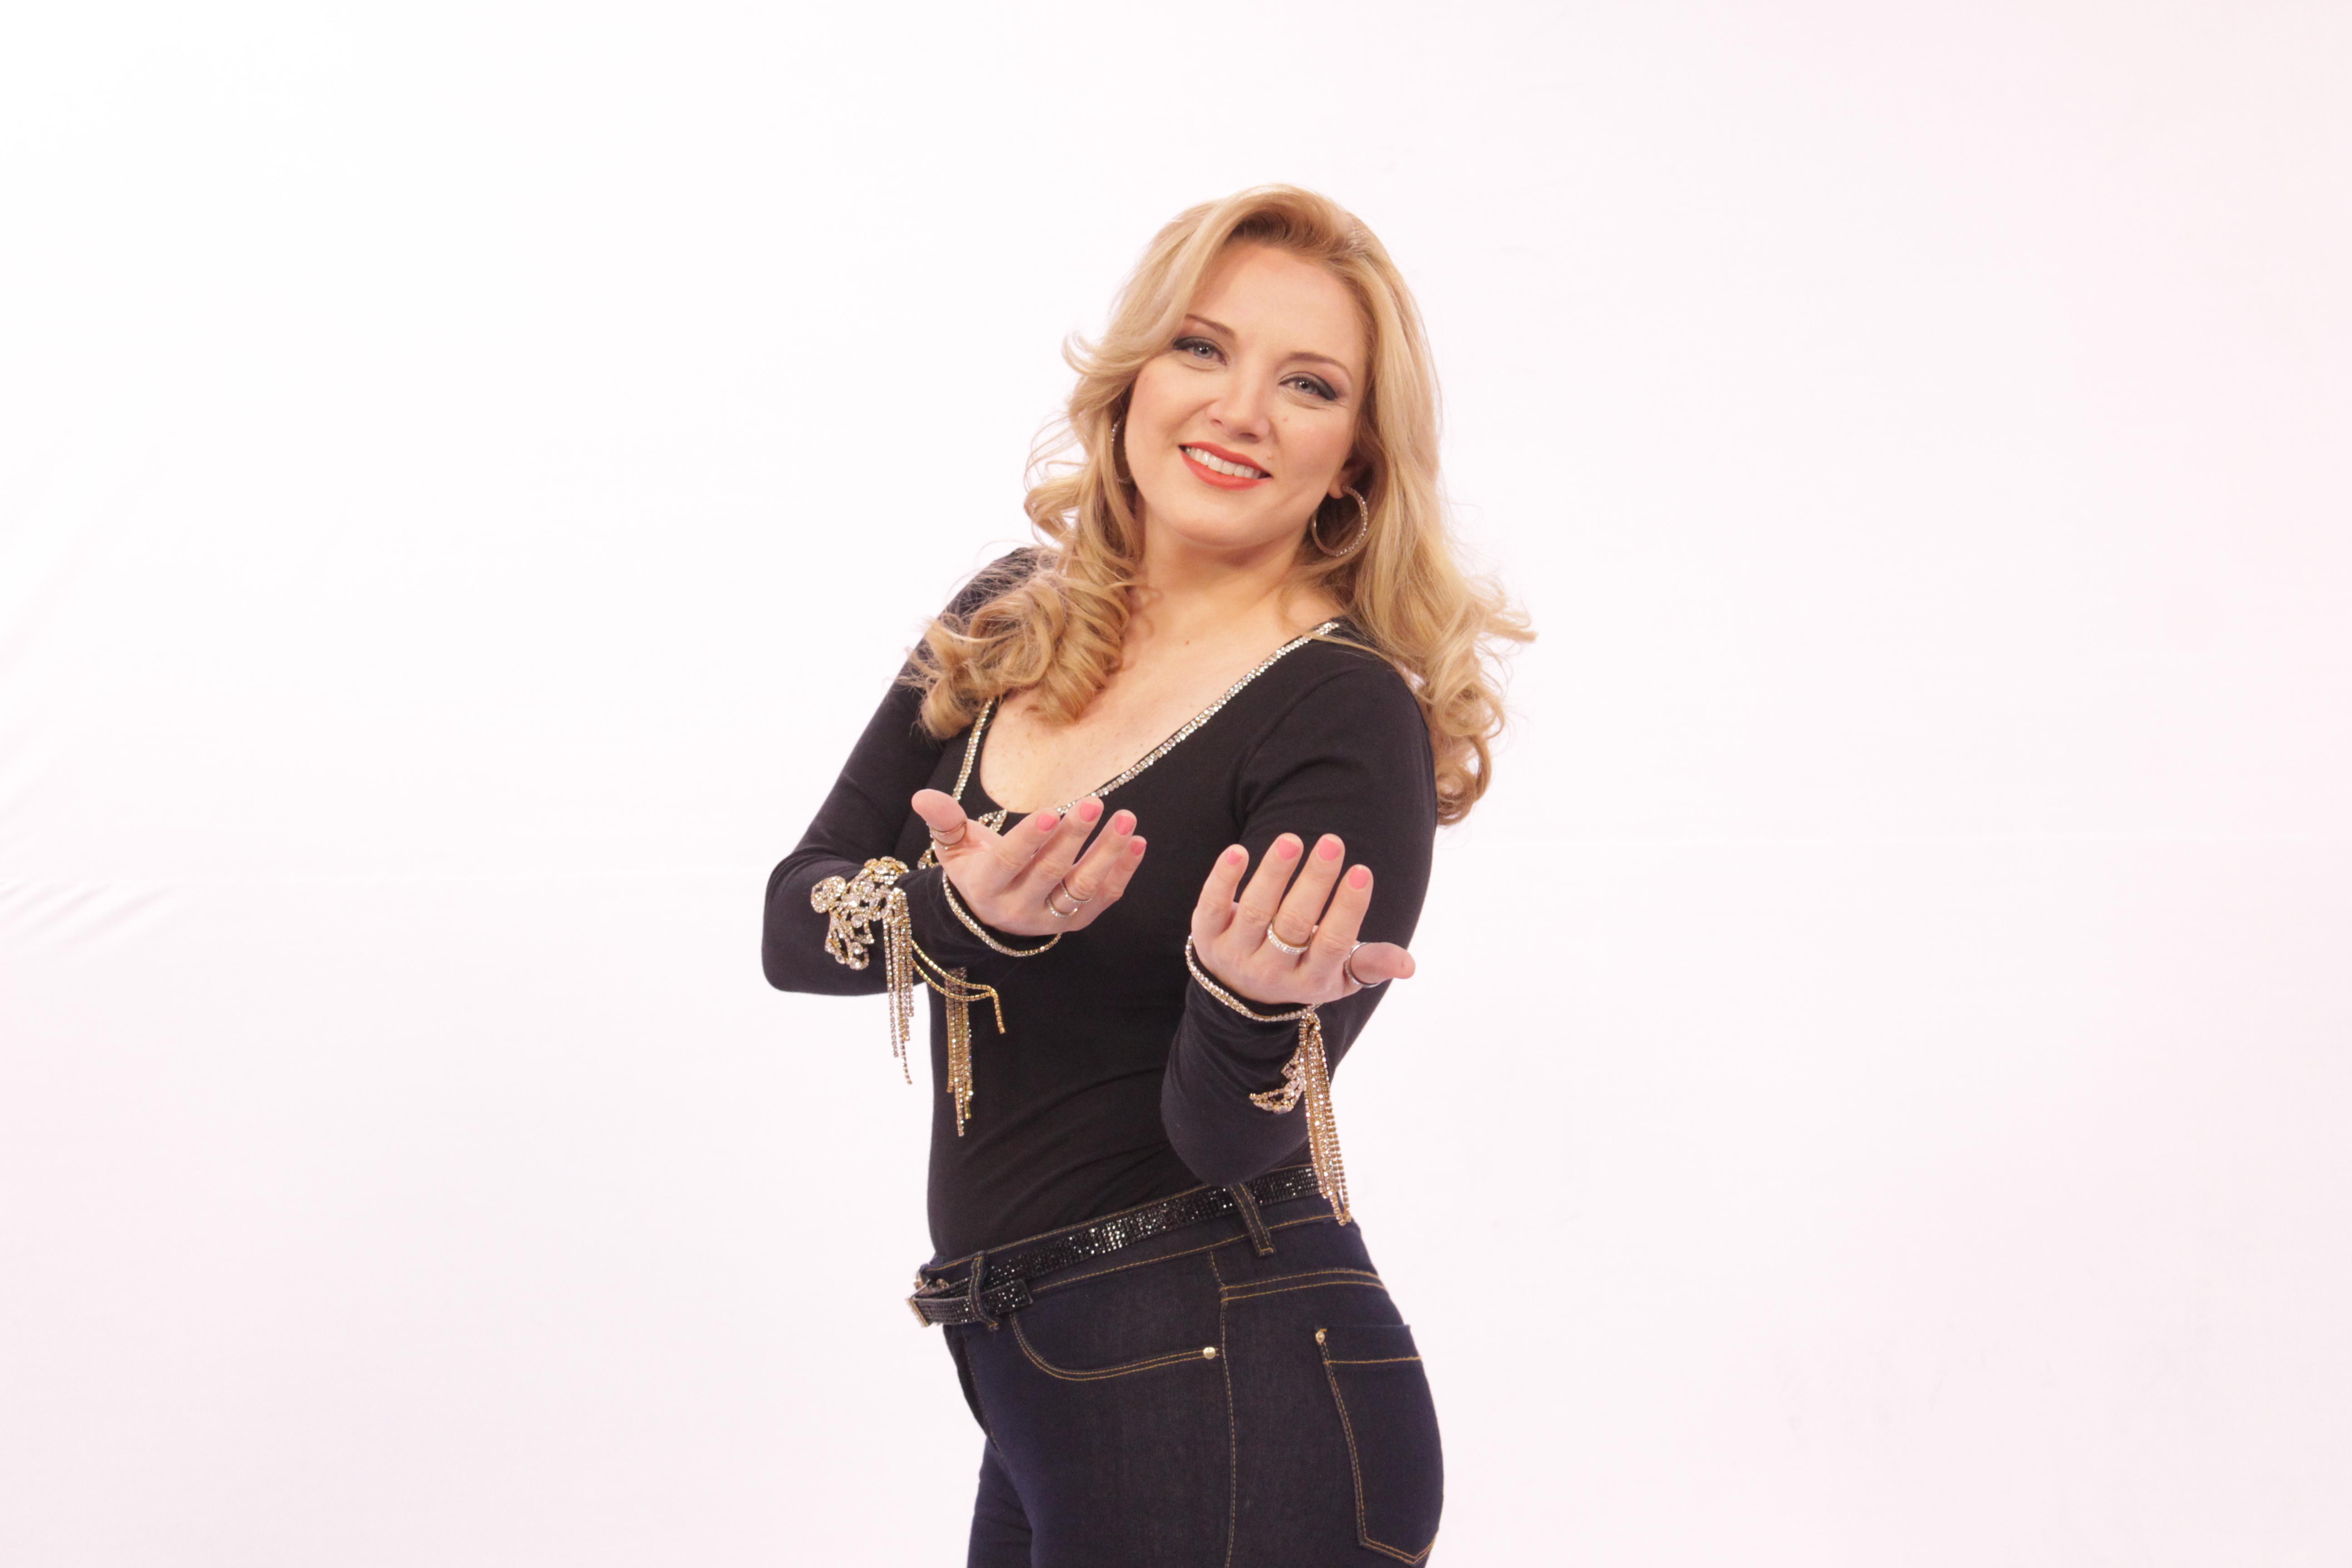 Mariângela Zan ~ TV Aparecida dita moda sertaneja e aposta em Mariangela Zan no segmento de música raiz u2013 TV Foco